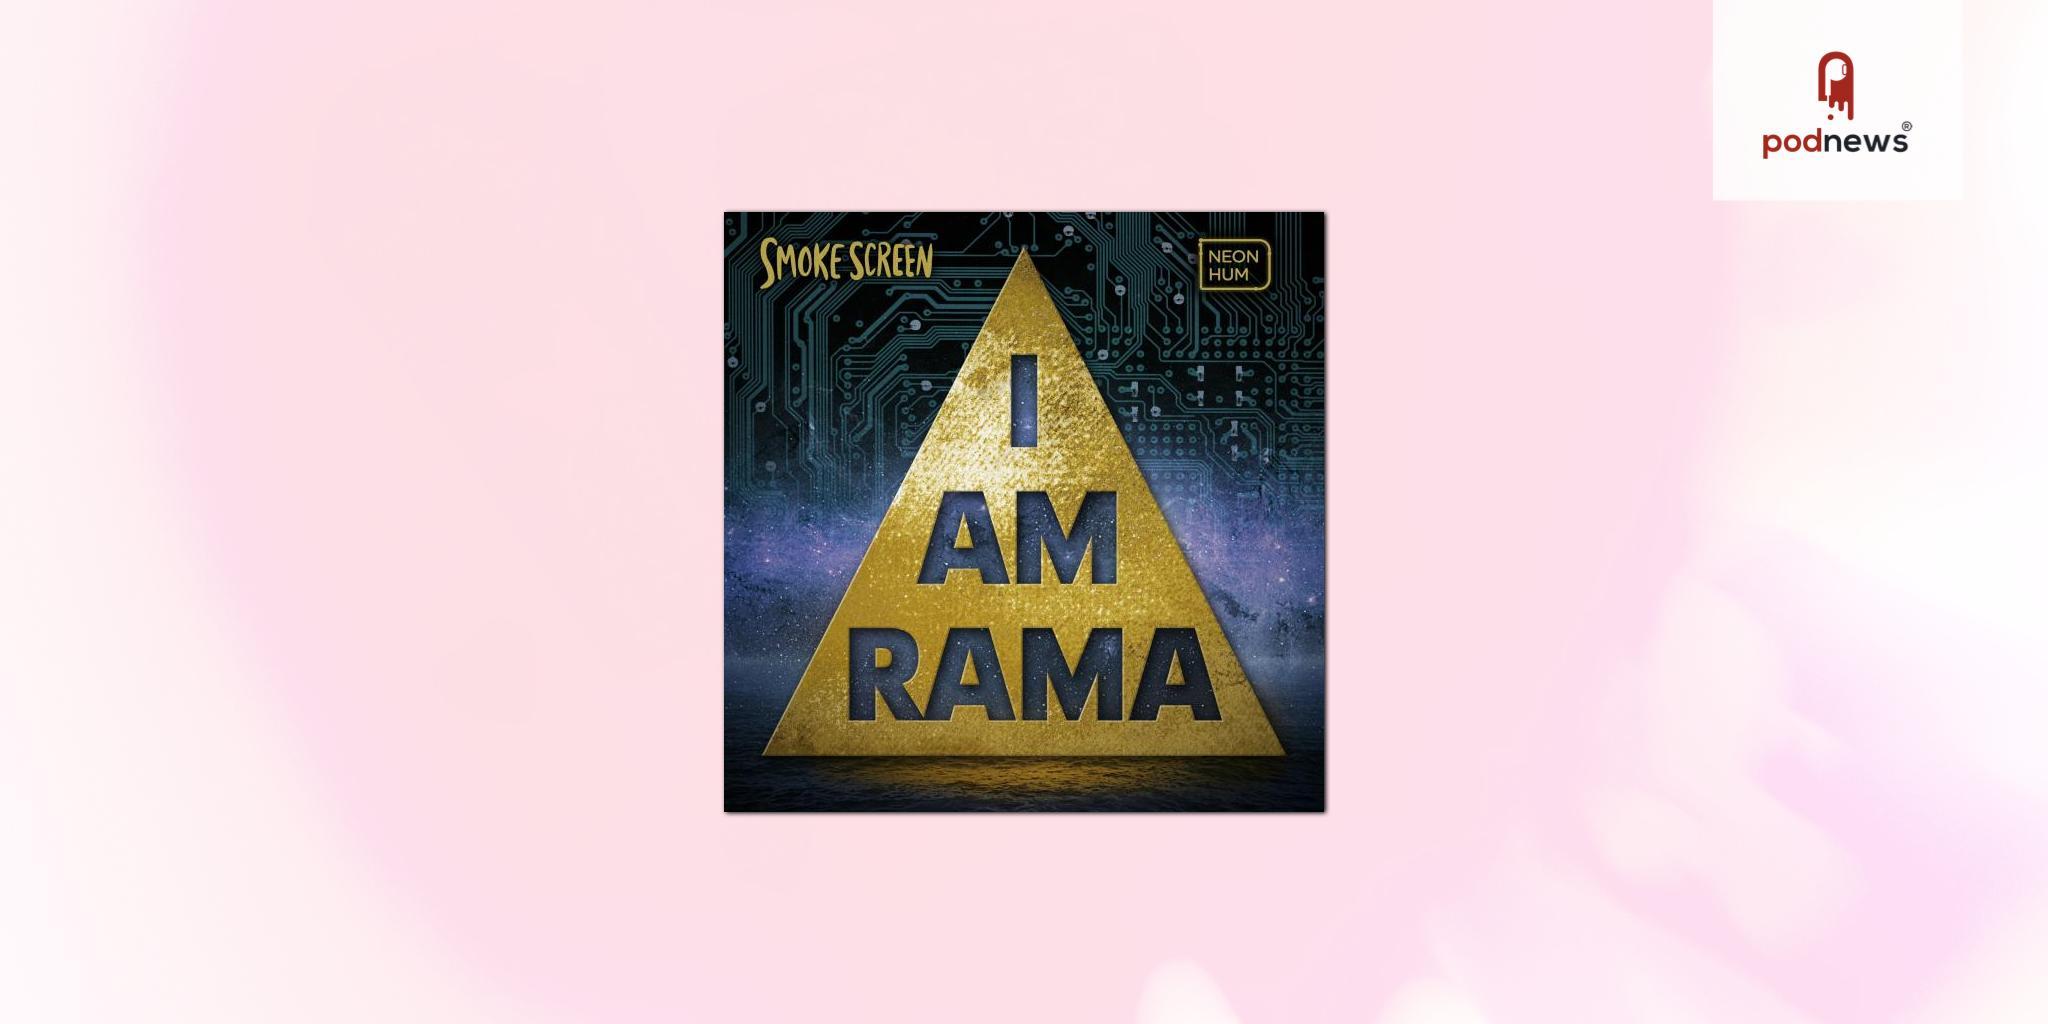 Neon Hum premieres Smoke Screen: I Am Rama, a new season of its investigative documentary podcast